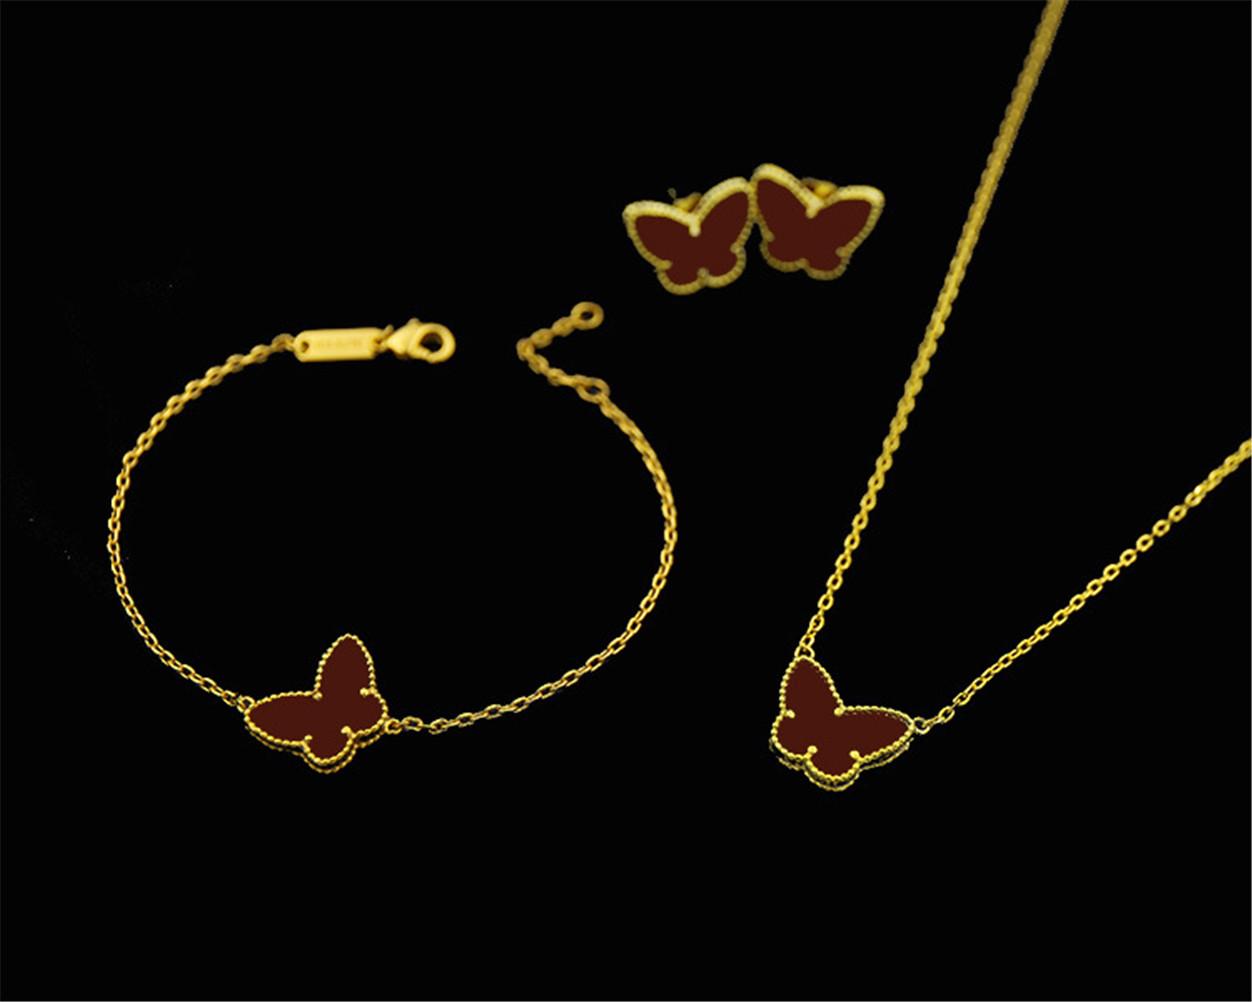 Van 18K Gold Fashion Classic Sweet 4/Four Leaf Clover Butterfly Earrings Bracelet Necklace Jewelry Set for S925 Silver Van Women&Girls Wedding Valentine's Day Gift